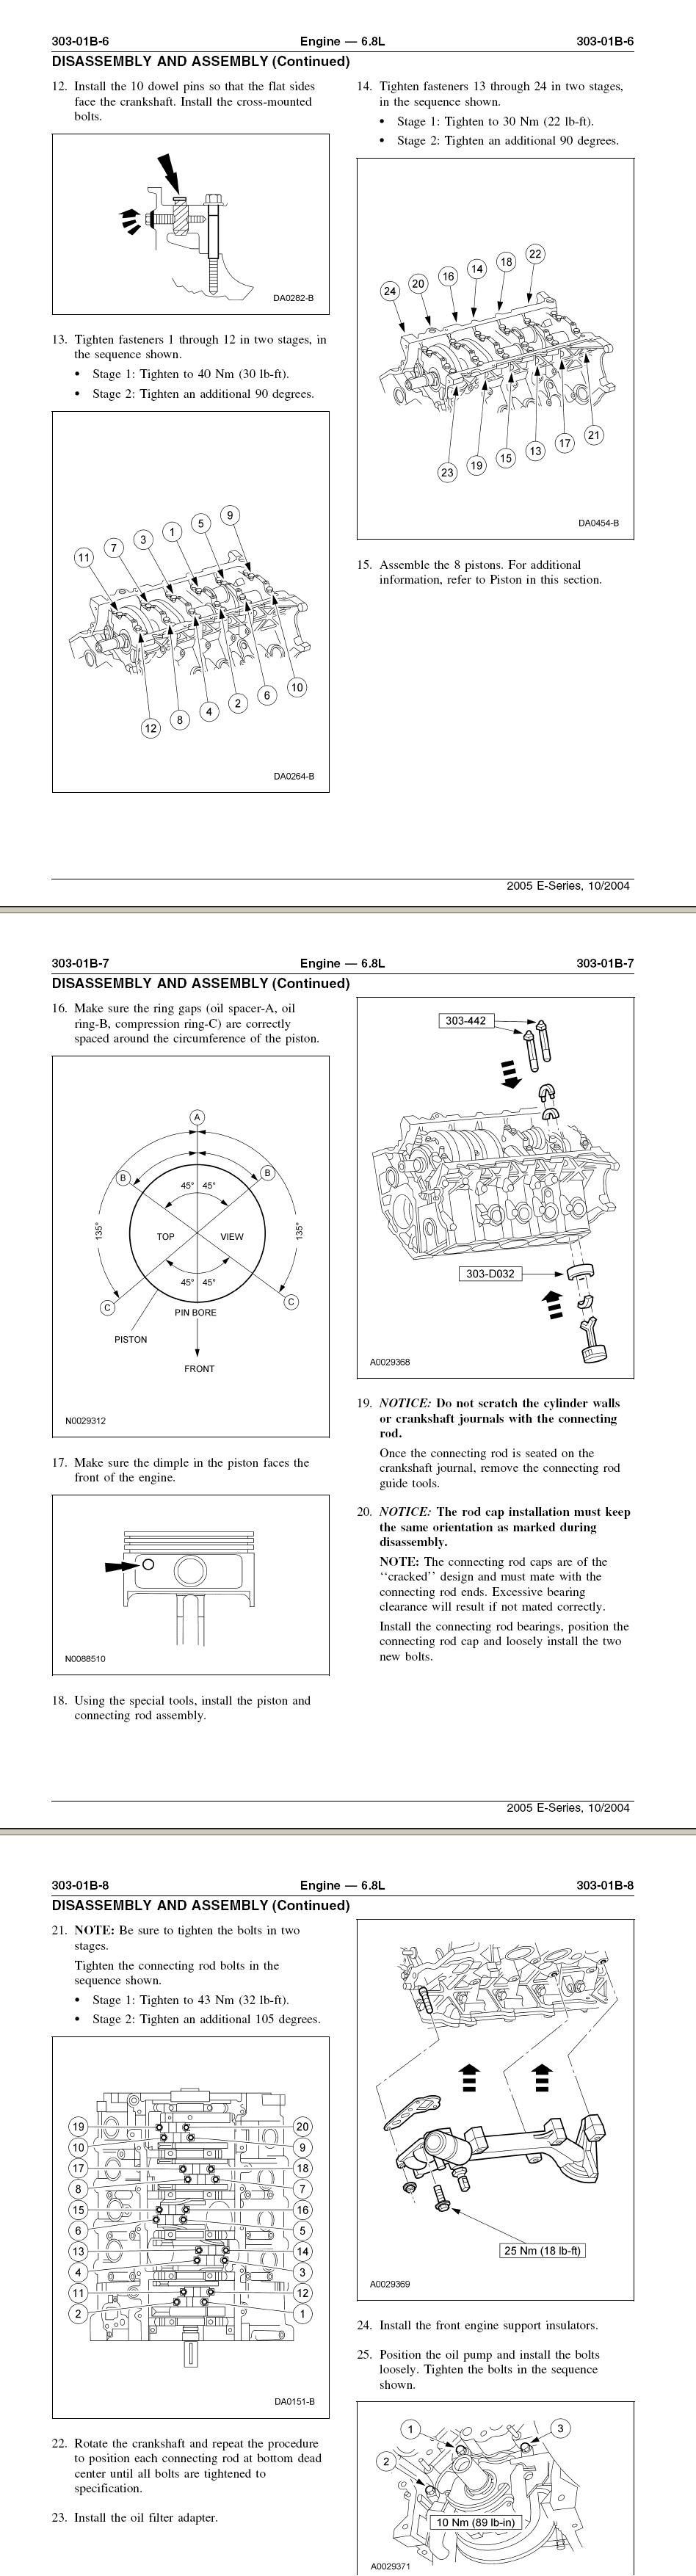 V10 Timing Chain Settings 2004 5 4 Triton Engine Diagram Graphic